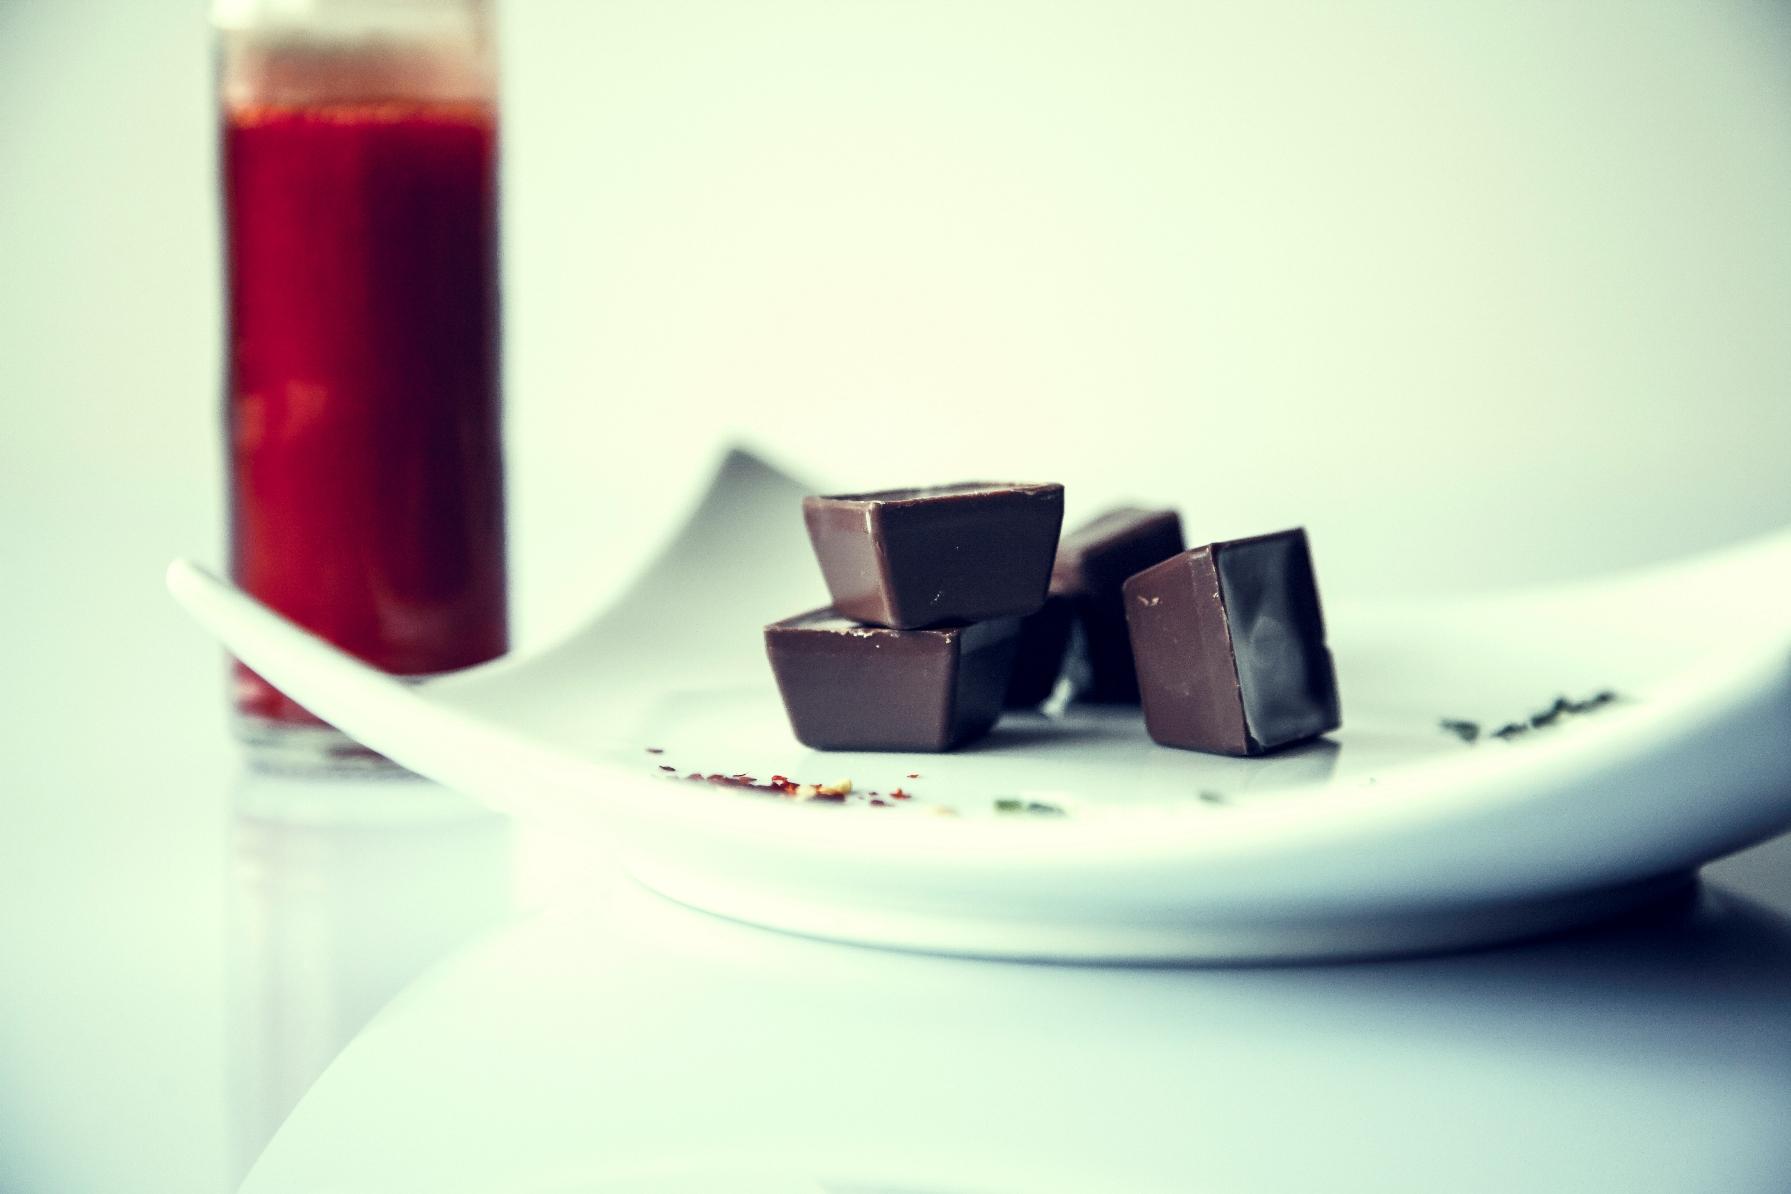 schokoladen scharf / hot chocolate